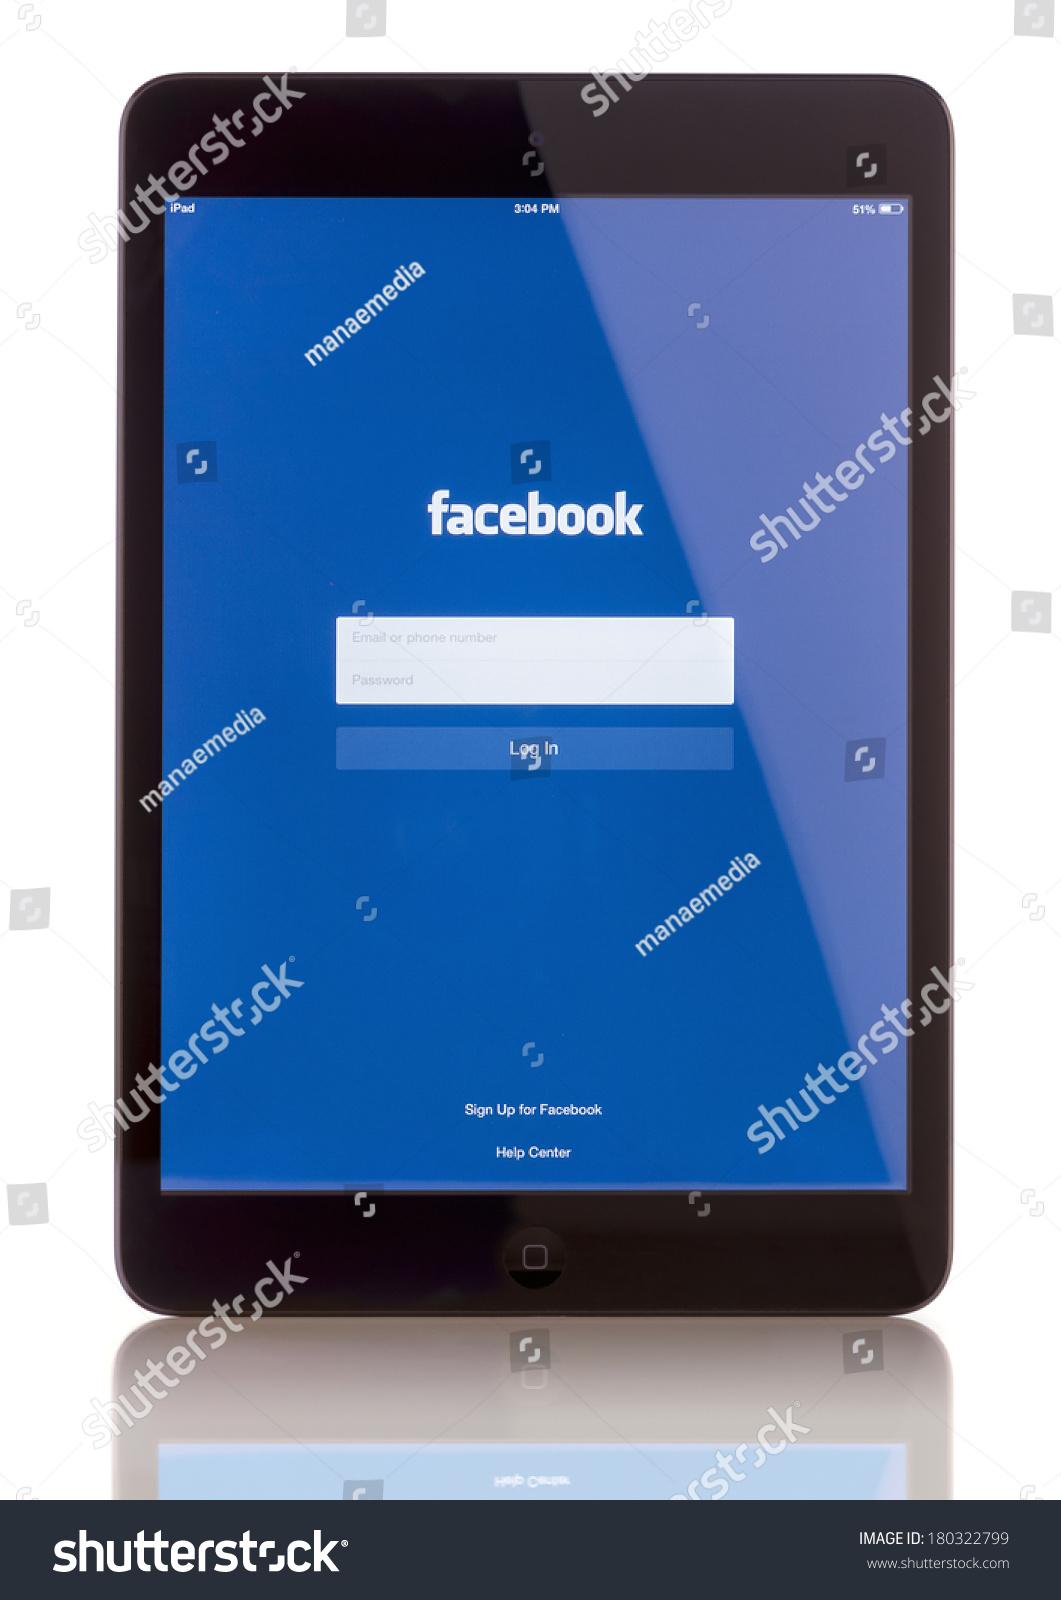 Galati romania january 23 2014 ipad mini displaying start up screen of facebook application - Application architecture ipad ...